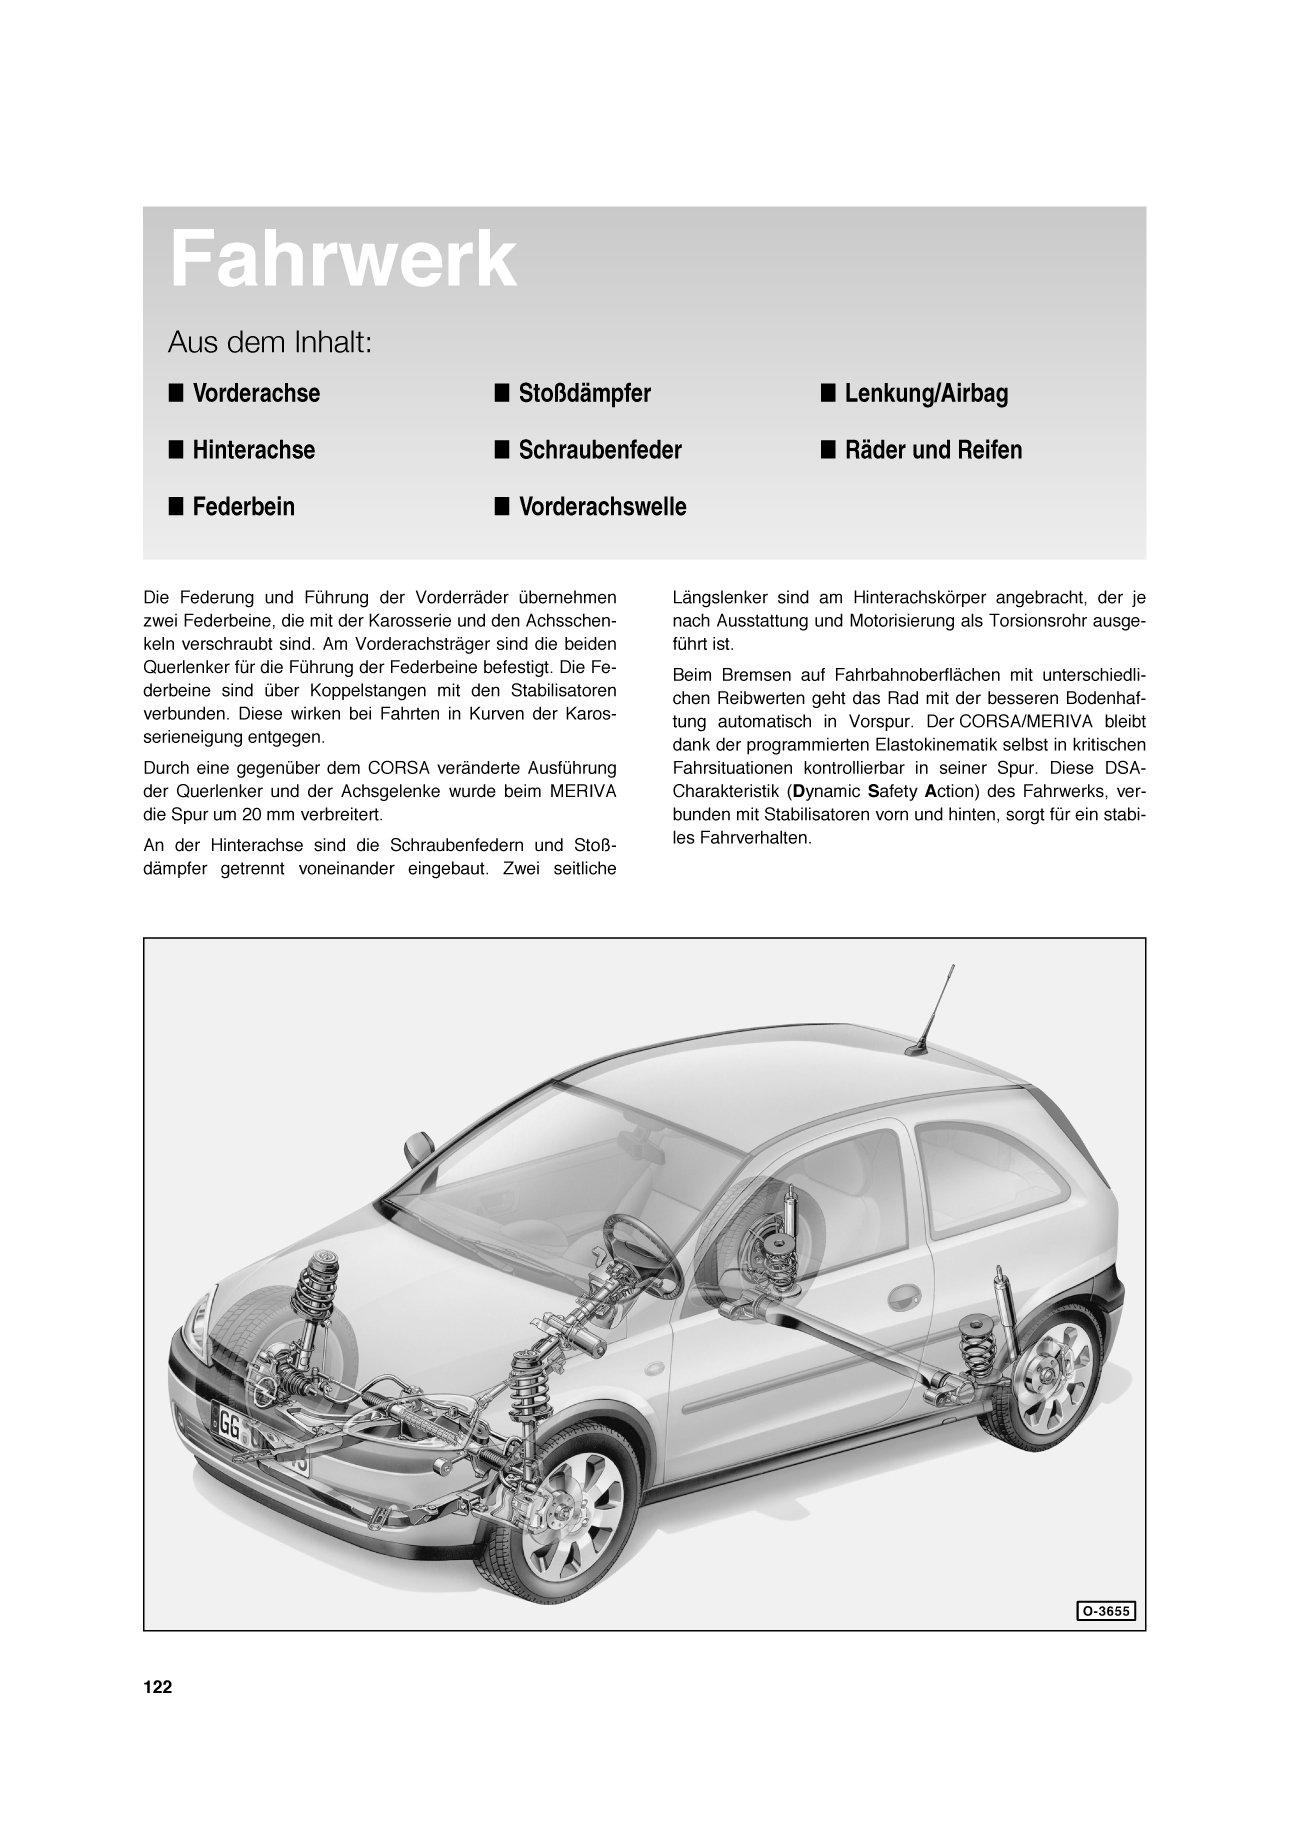 Opel Corsa C 9/00 bis 9/06: Opel Meriva 5/03 bis 4/10, So wird´s ...